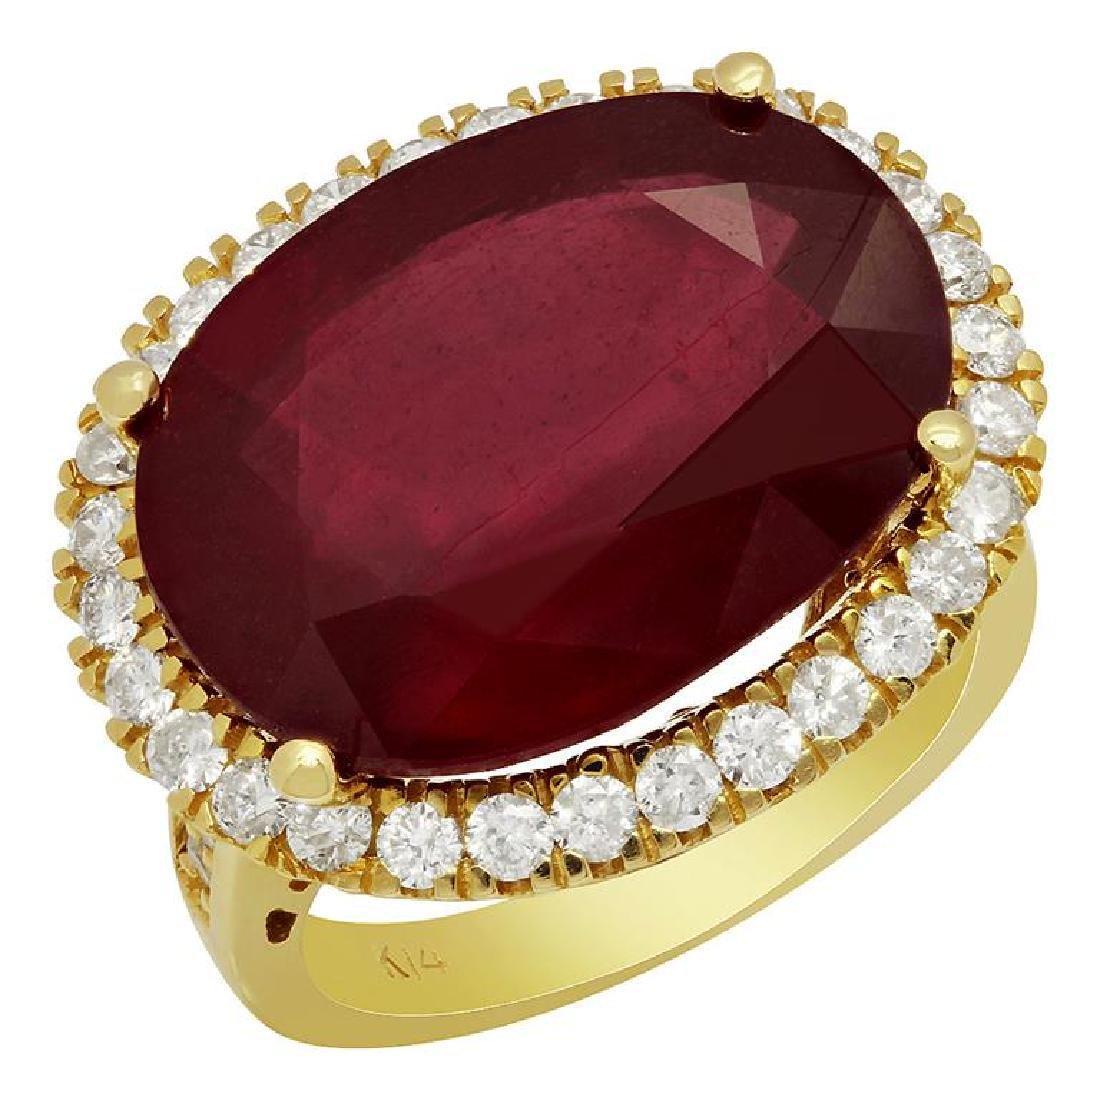 14k Yellow Gold 18.24ct Ruby 1.11ct Diamond Ring